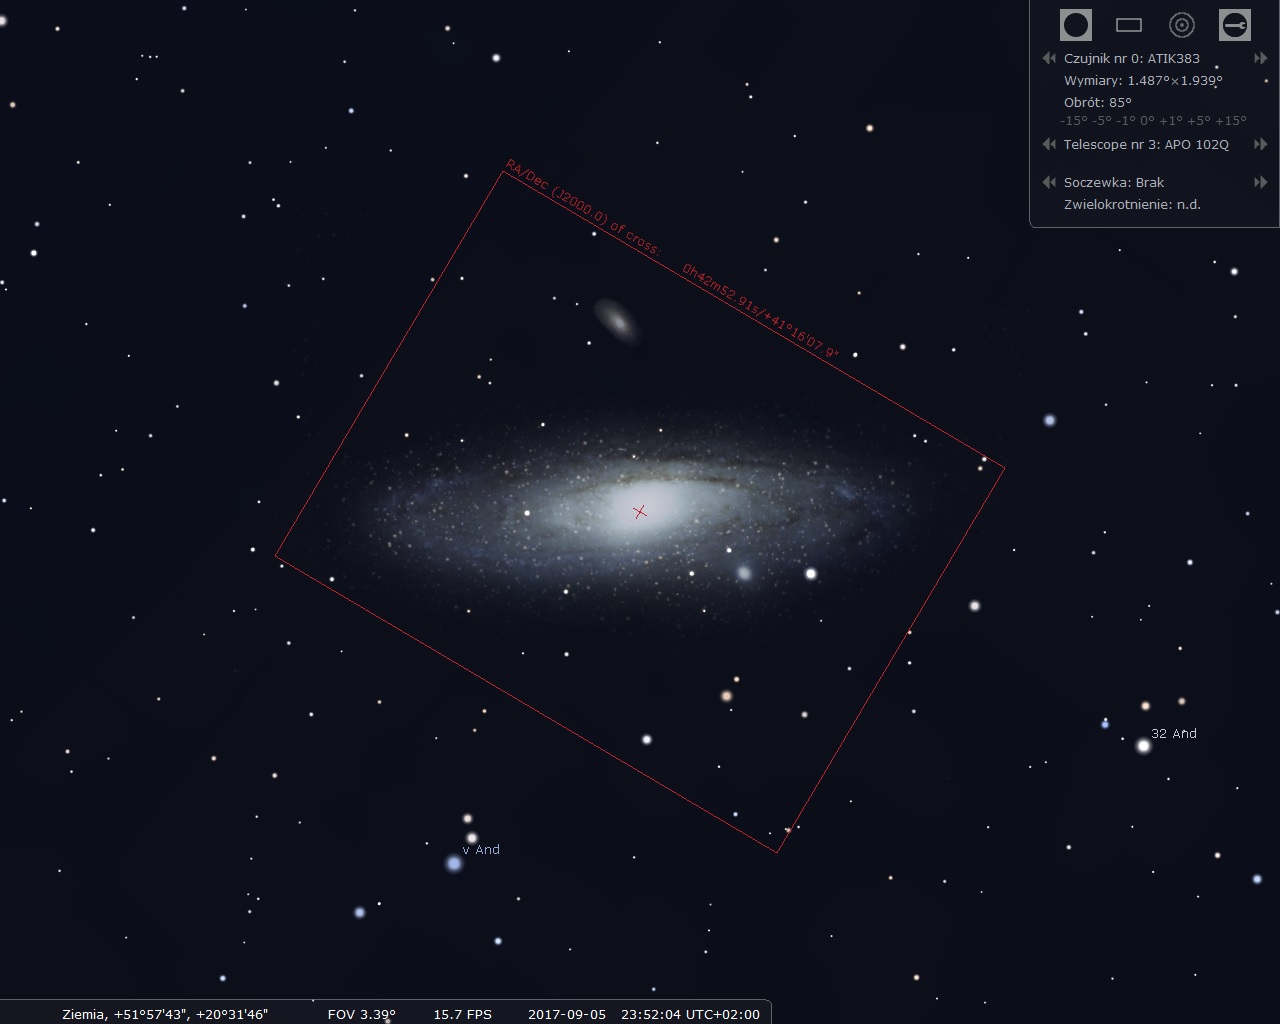 M31.jpg.7d0b3abd74c9ae637607a08e64c48d52.jpg